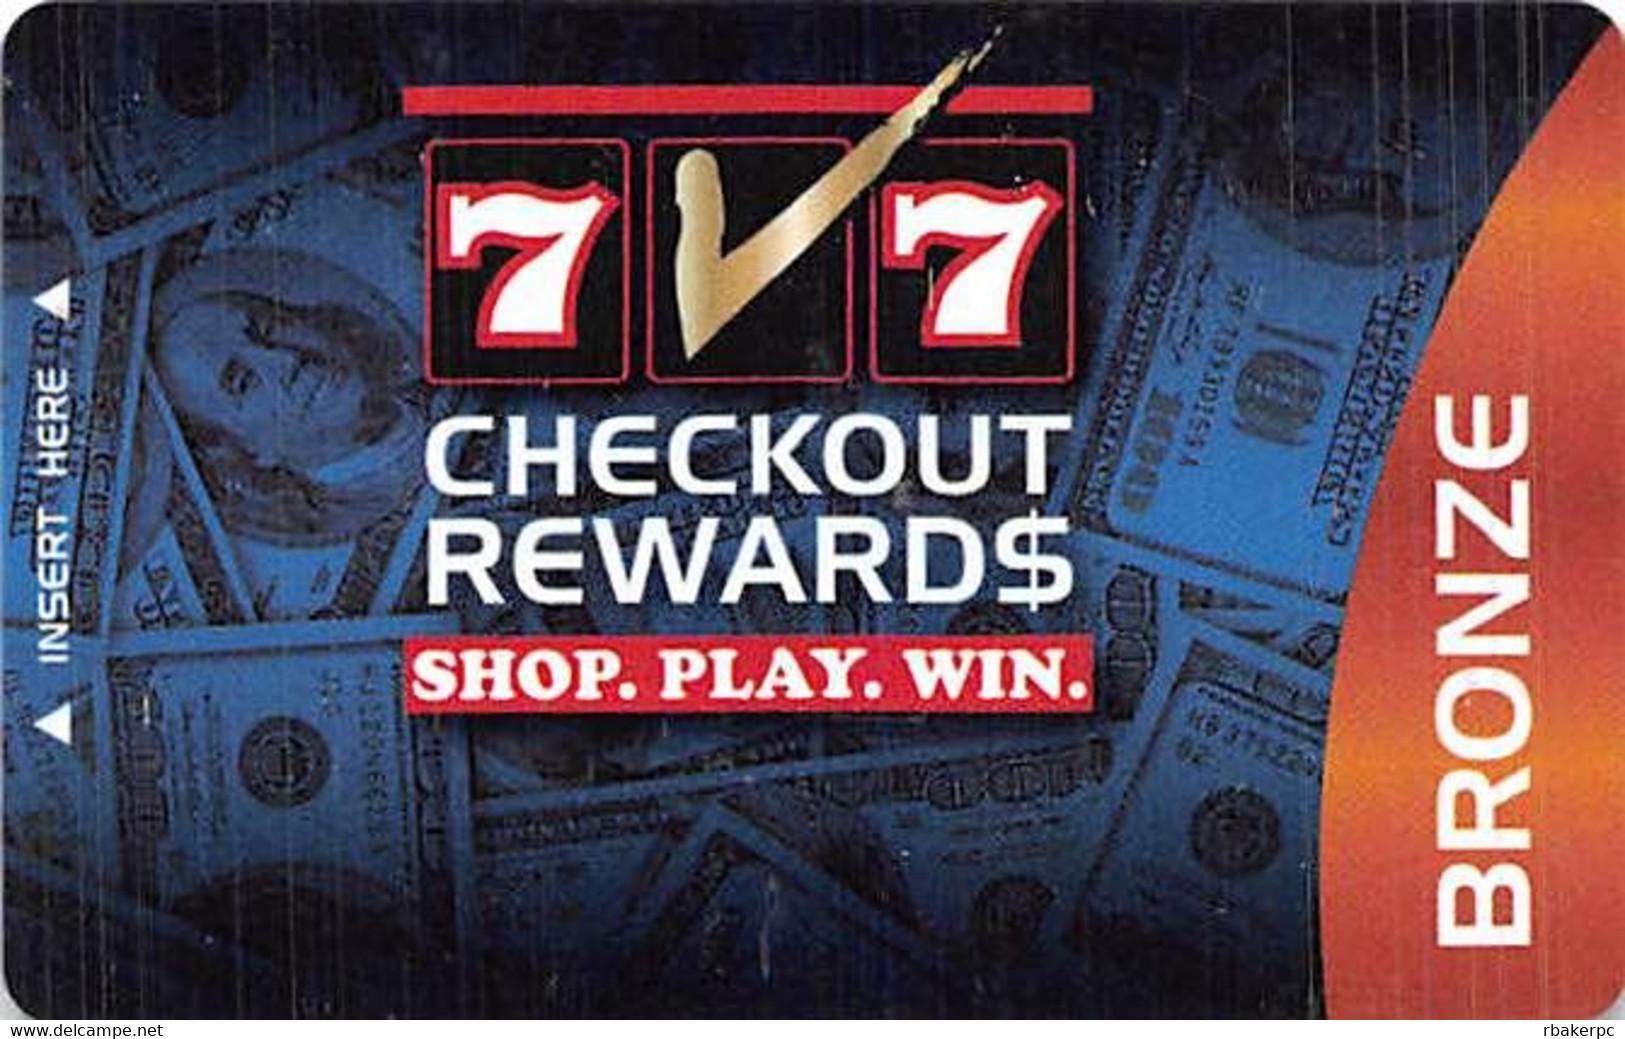 Golden Route Operations - Las Vegas, NV - BLANK Bronze Player Rewards / Slot Card - 4 Logos - Casino Cards